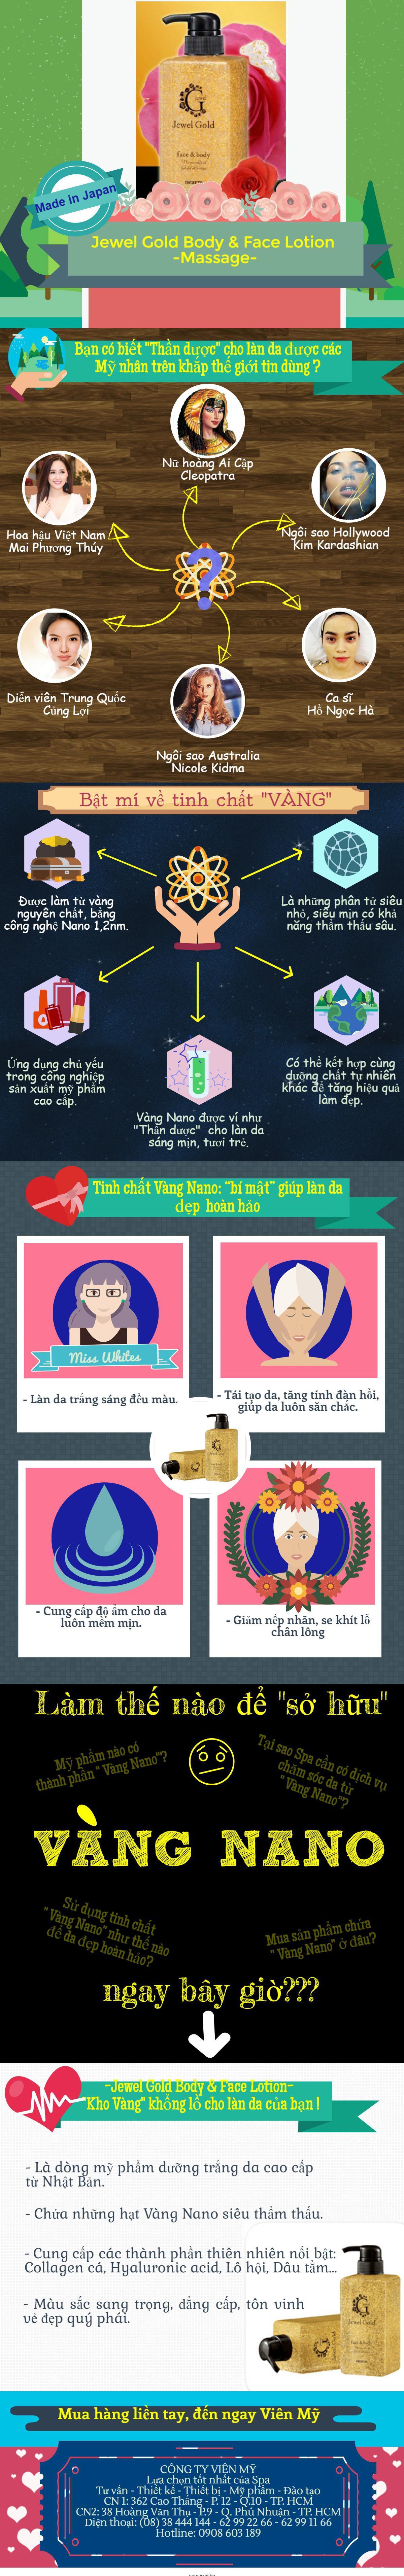 inforgraphic-massage-vang-nano-hoan-chinh